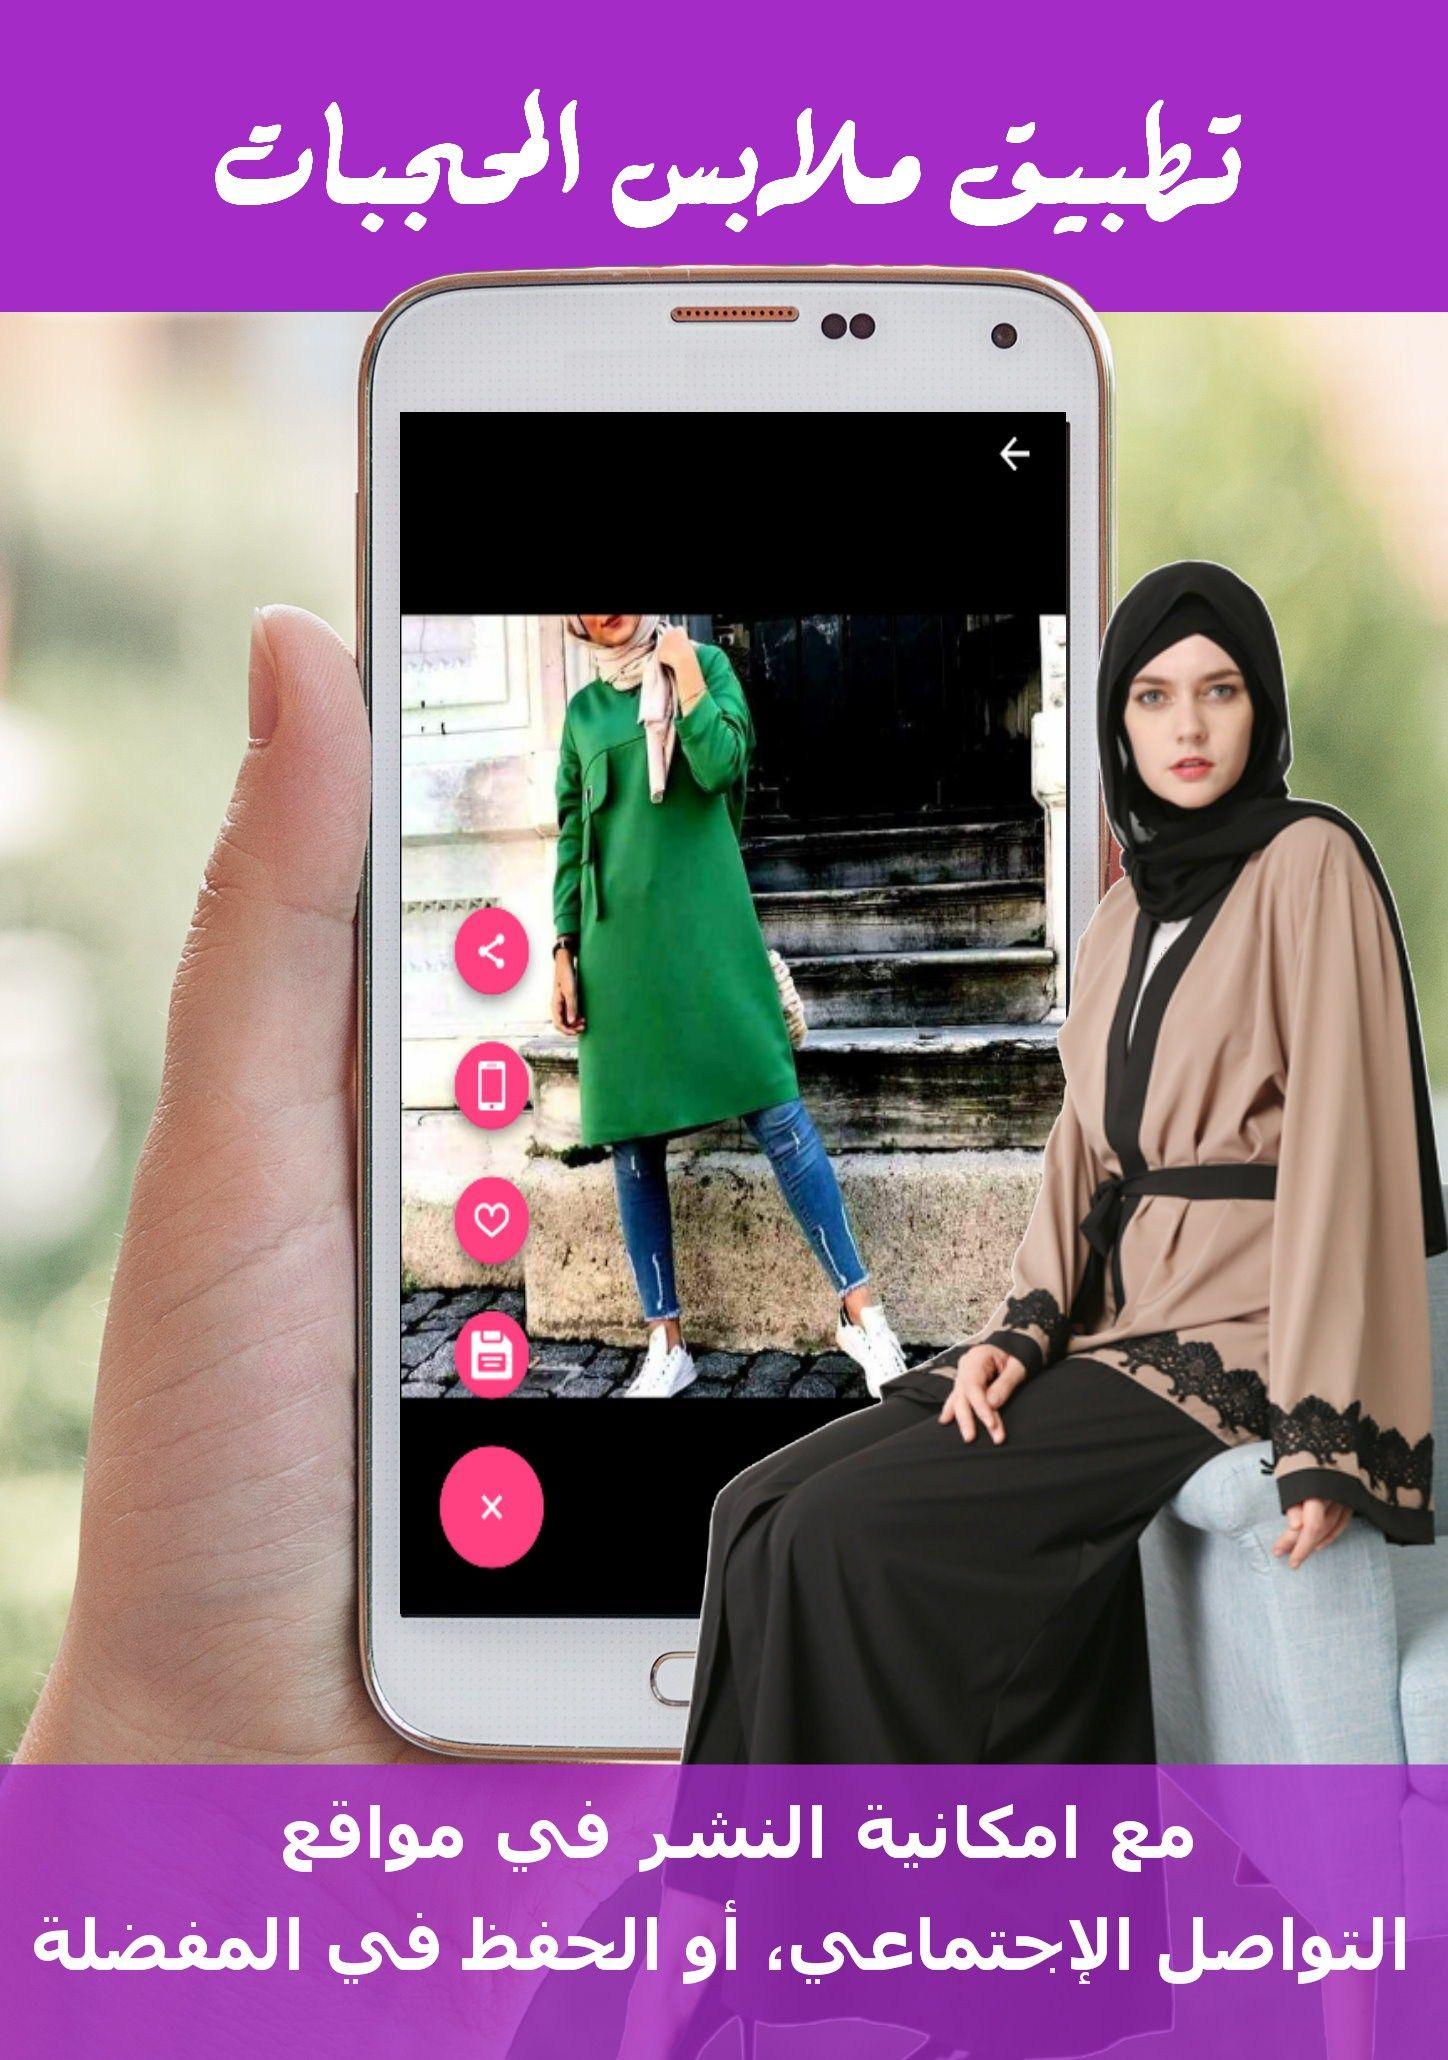 3e9a3f4d7 أروع ملابس المحجبات 2018 ملابس محجبات تركية، صور ملابس المحجبات رائعة في  تطبيق واحد